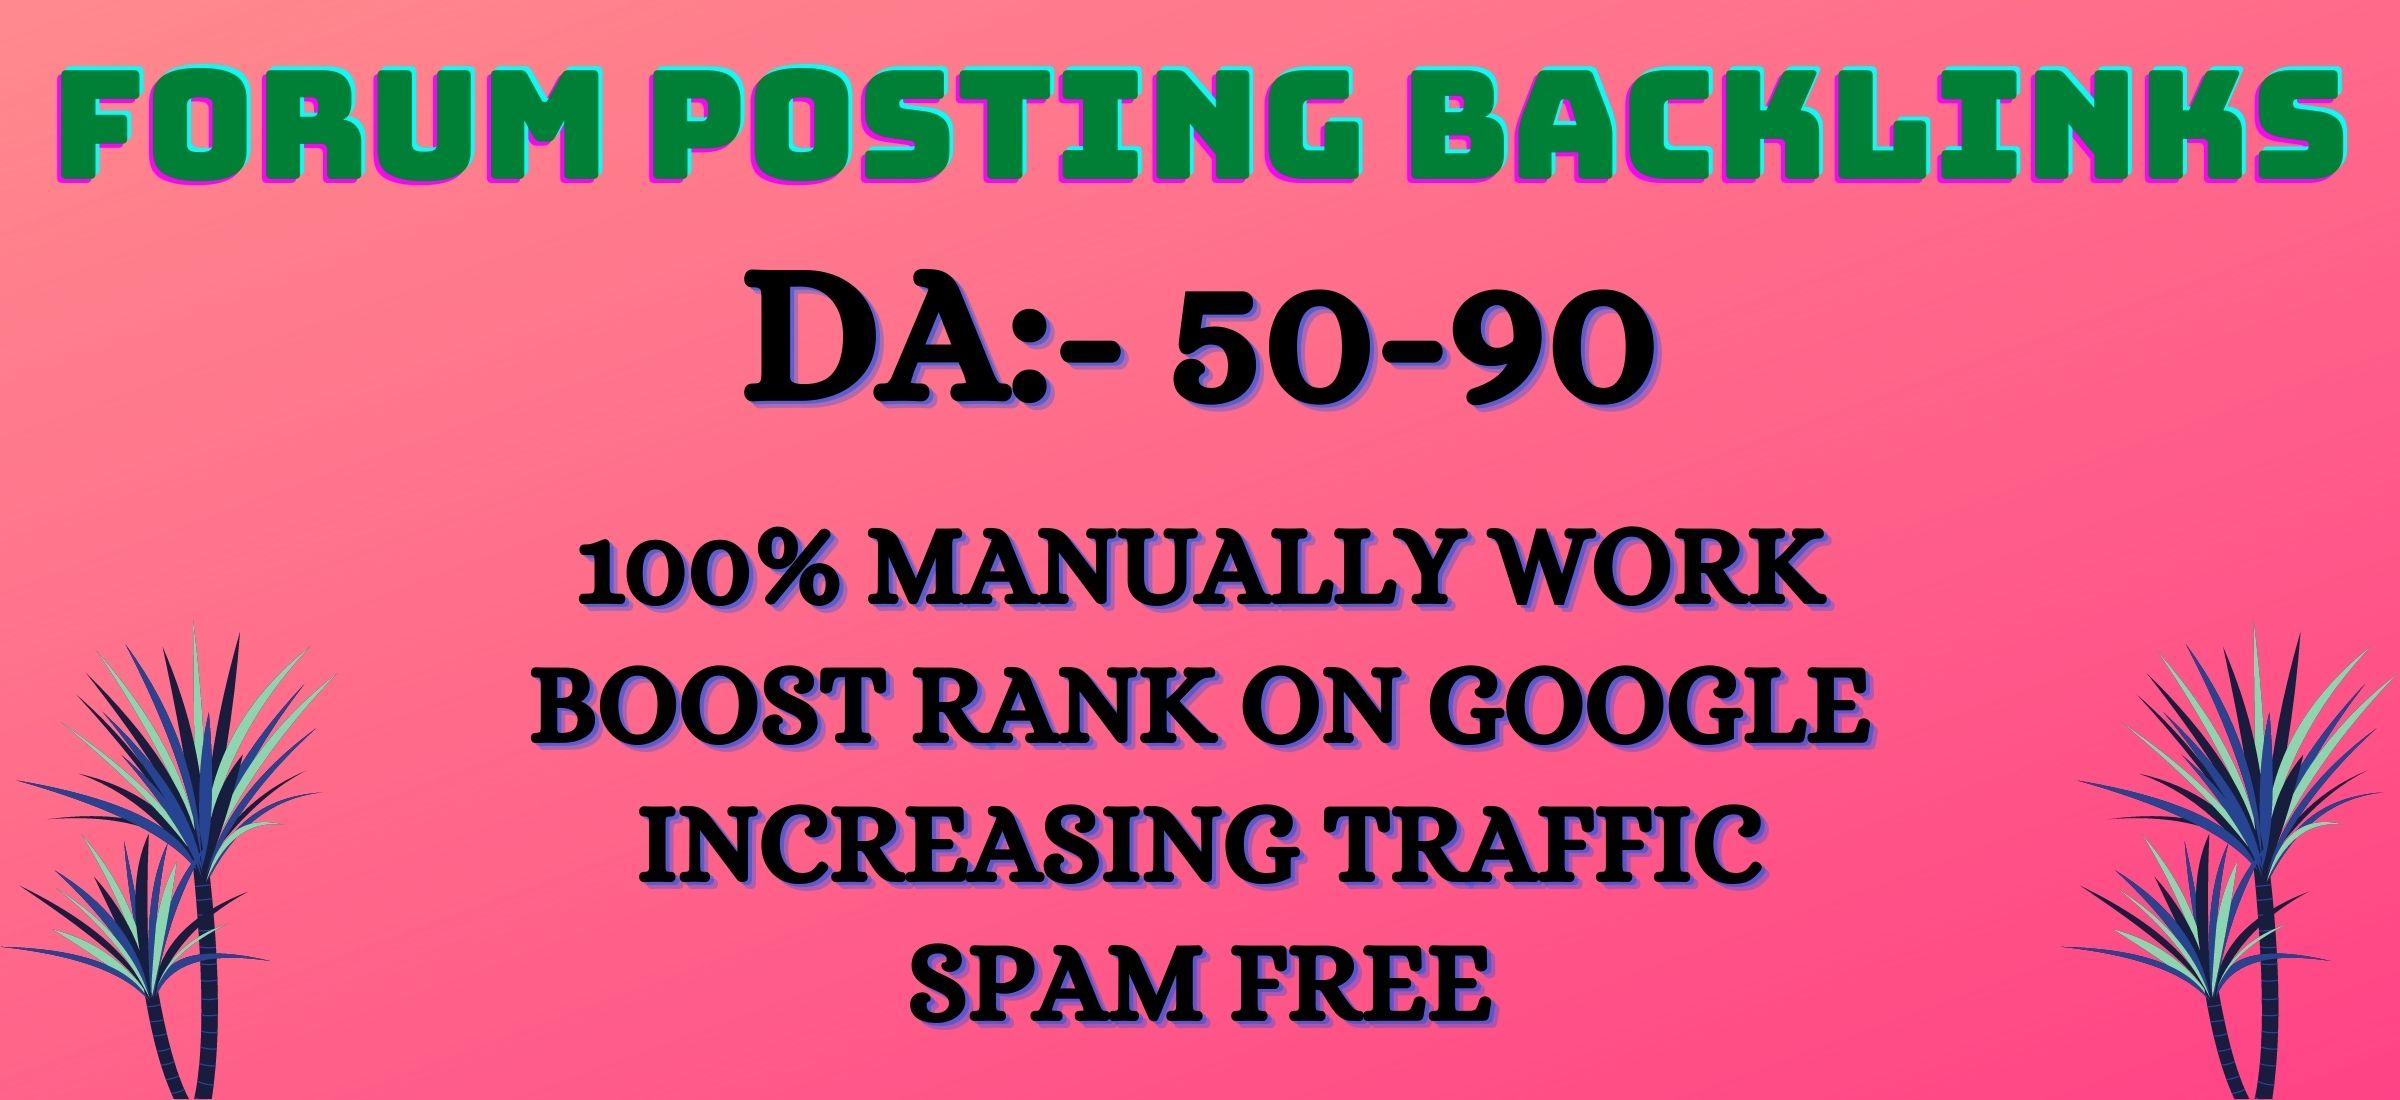 Manually create 30 forum posts backlink on high DA-50 plus sites